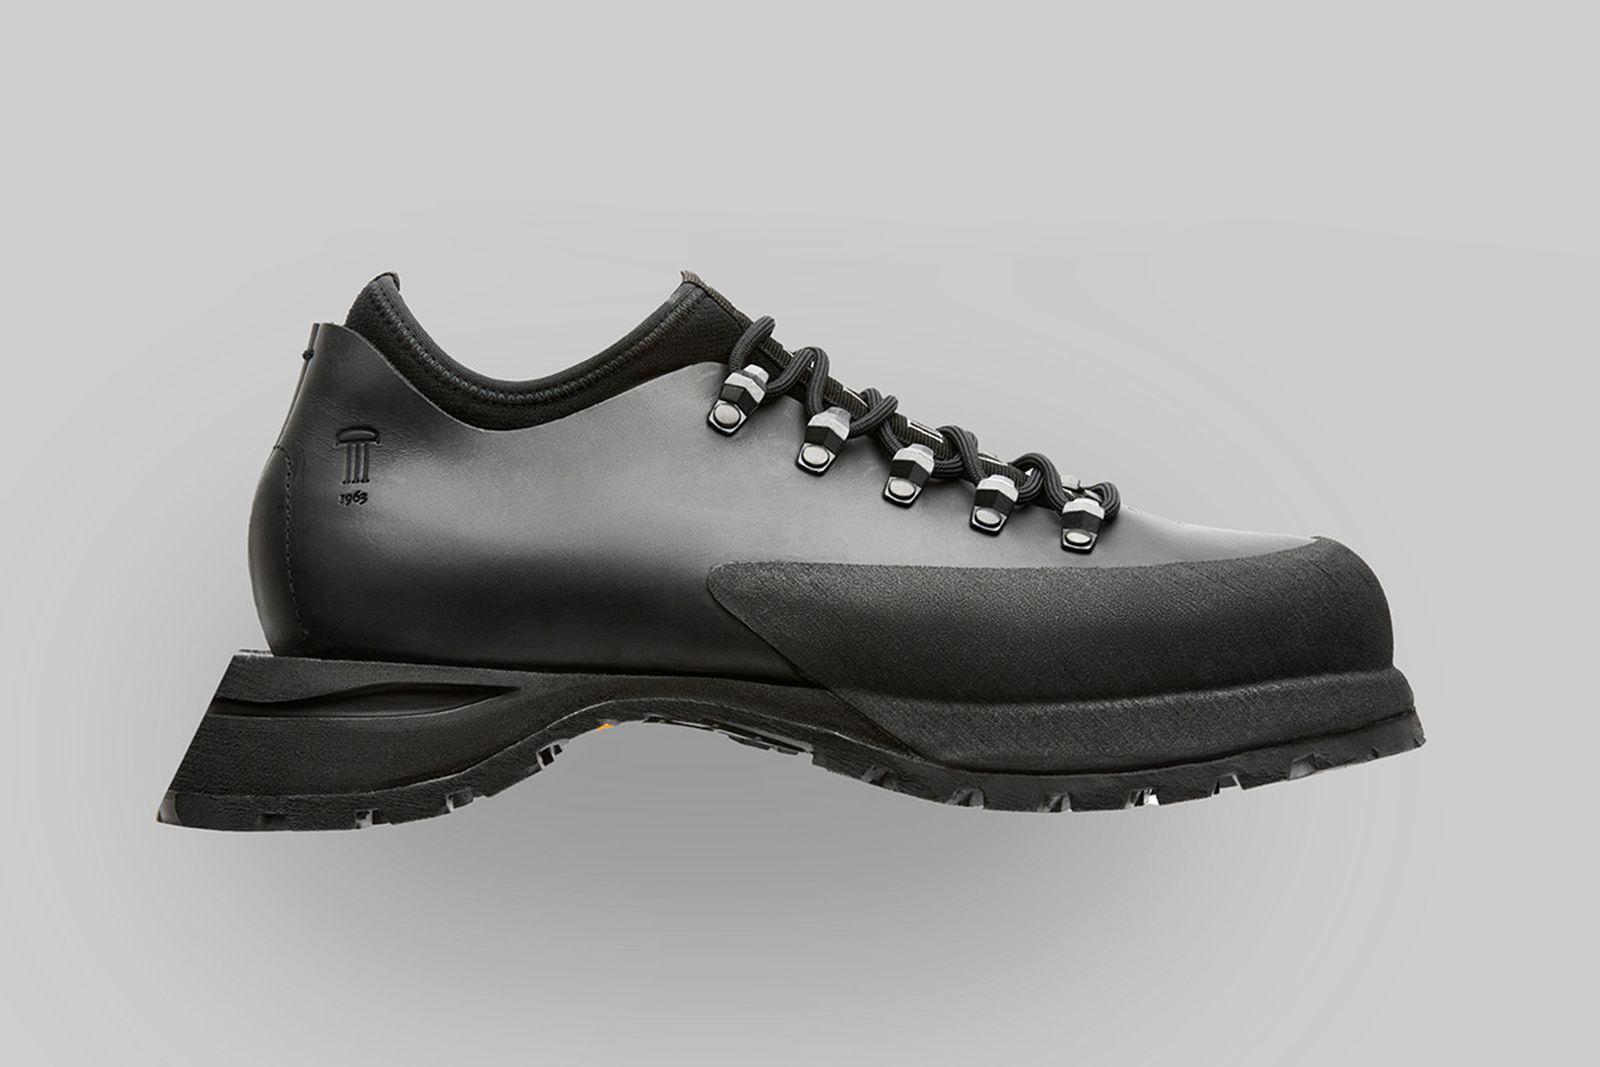 demon-hiking-footwear-interview-02